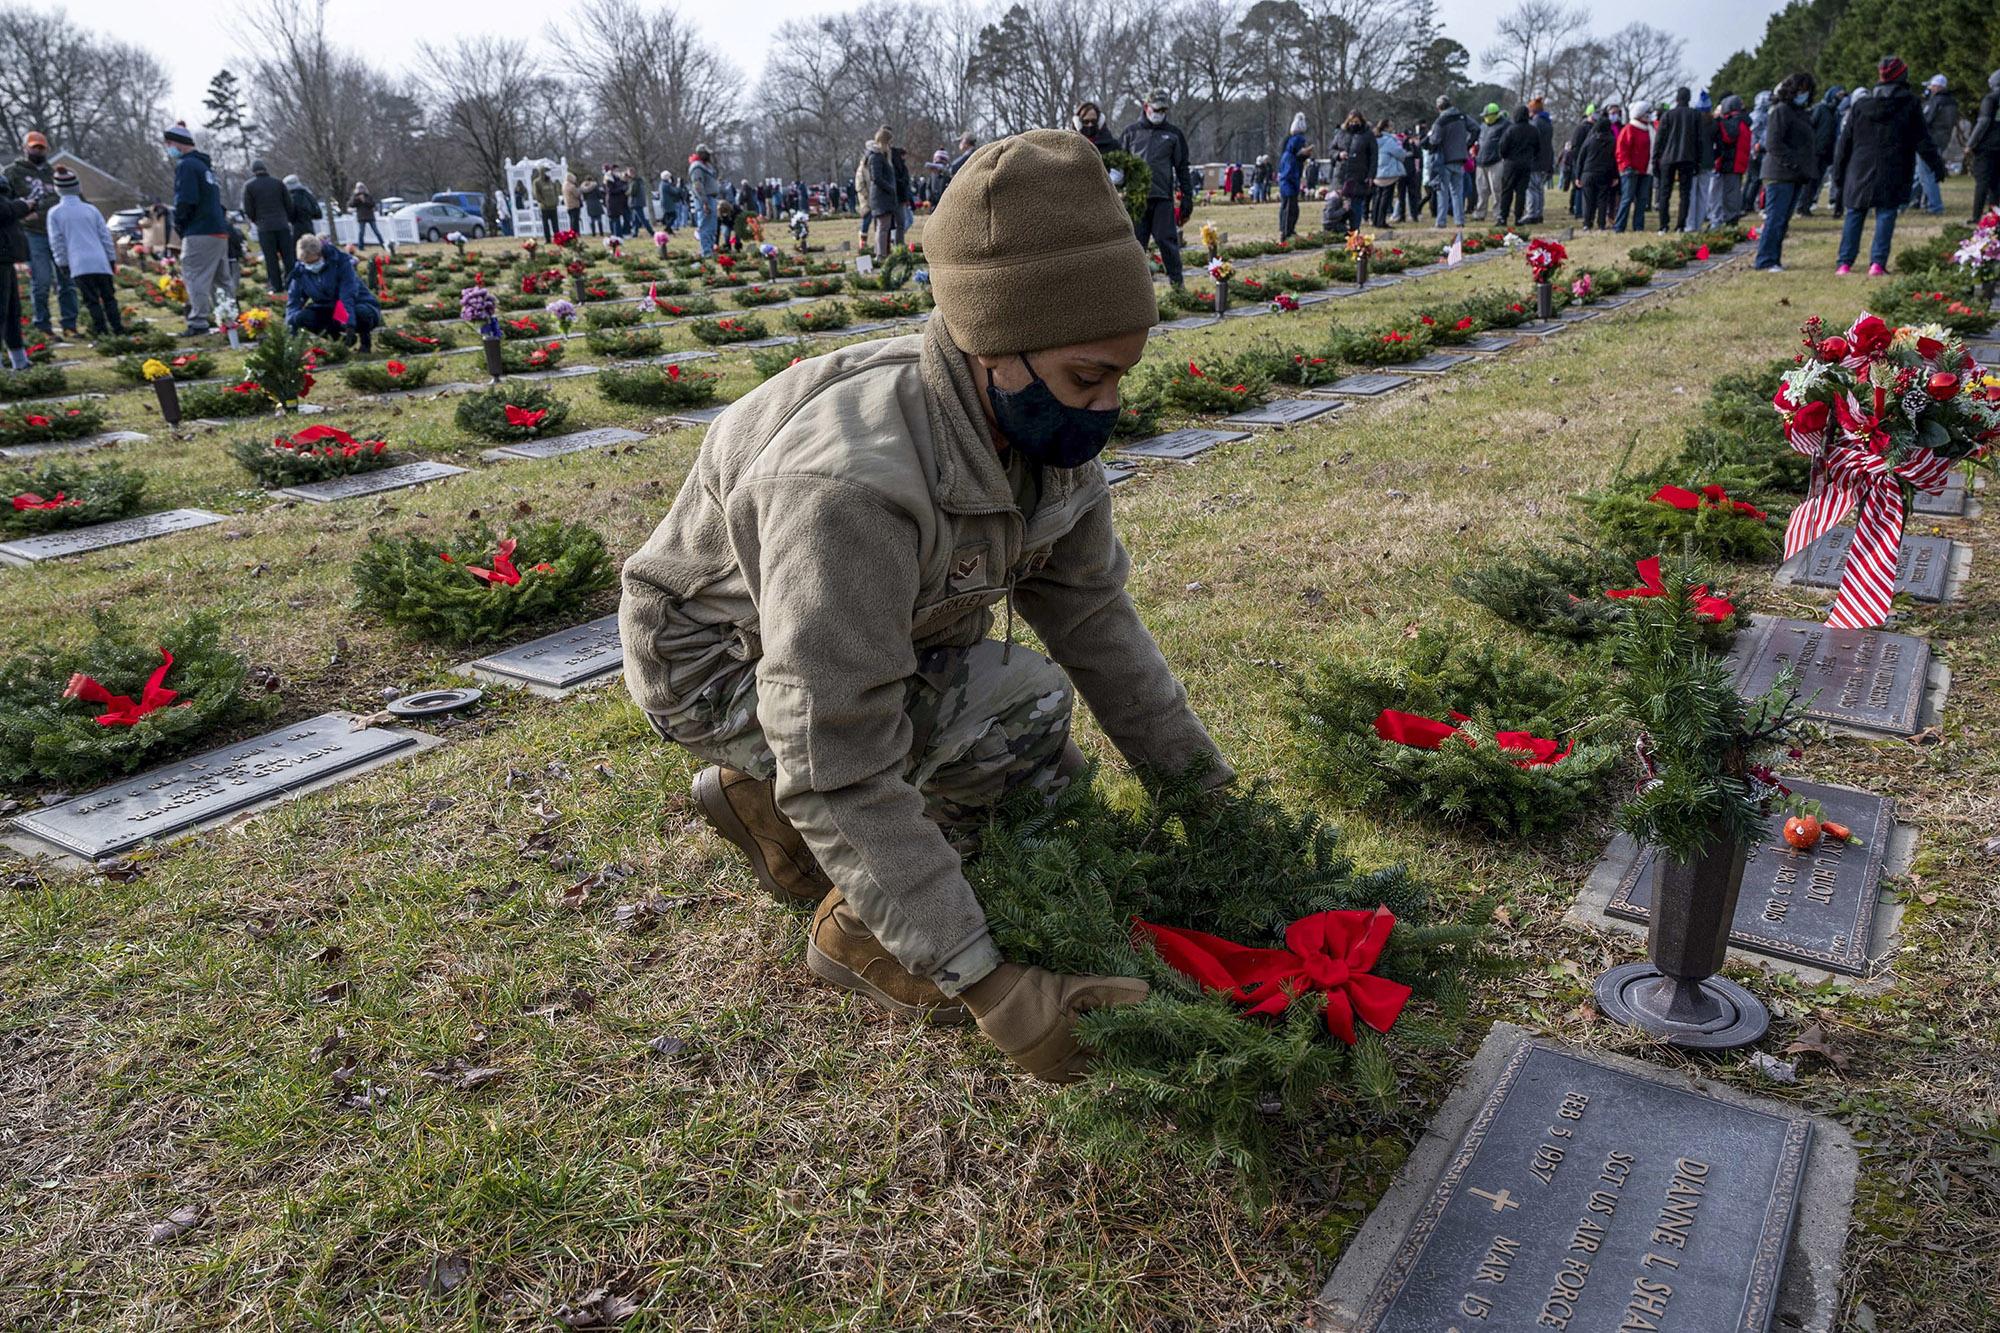 Senior Airman Amber Barkley lays a wreath on a grave at the Delaware Veterans Memorial Cemetery in Millsboro, Del., Dec. 19, 2020. (Airman 1st Class Faith Schaefer/Air Force)